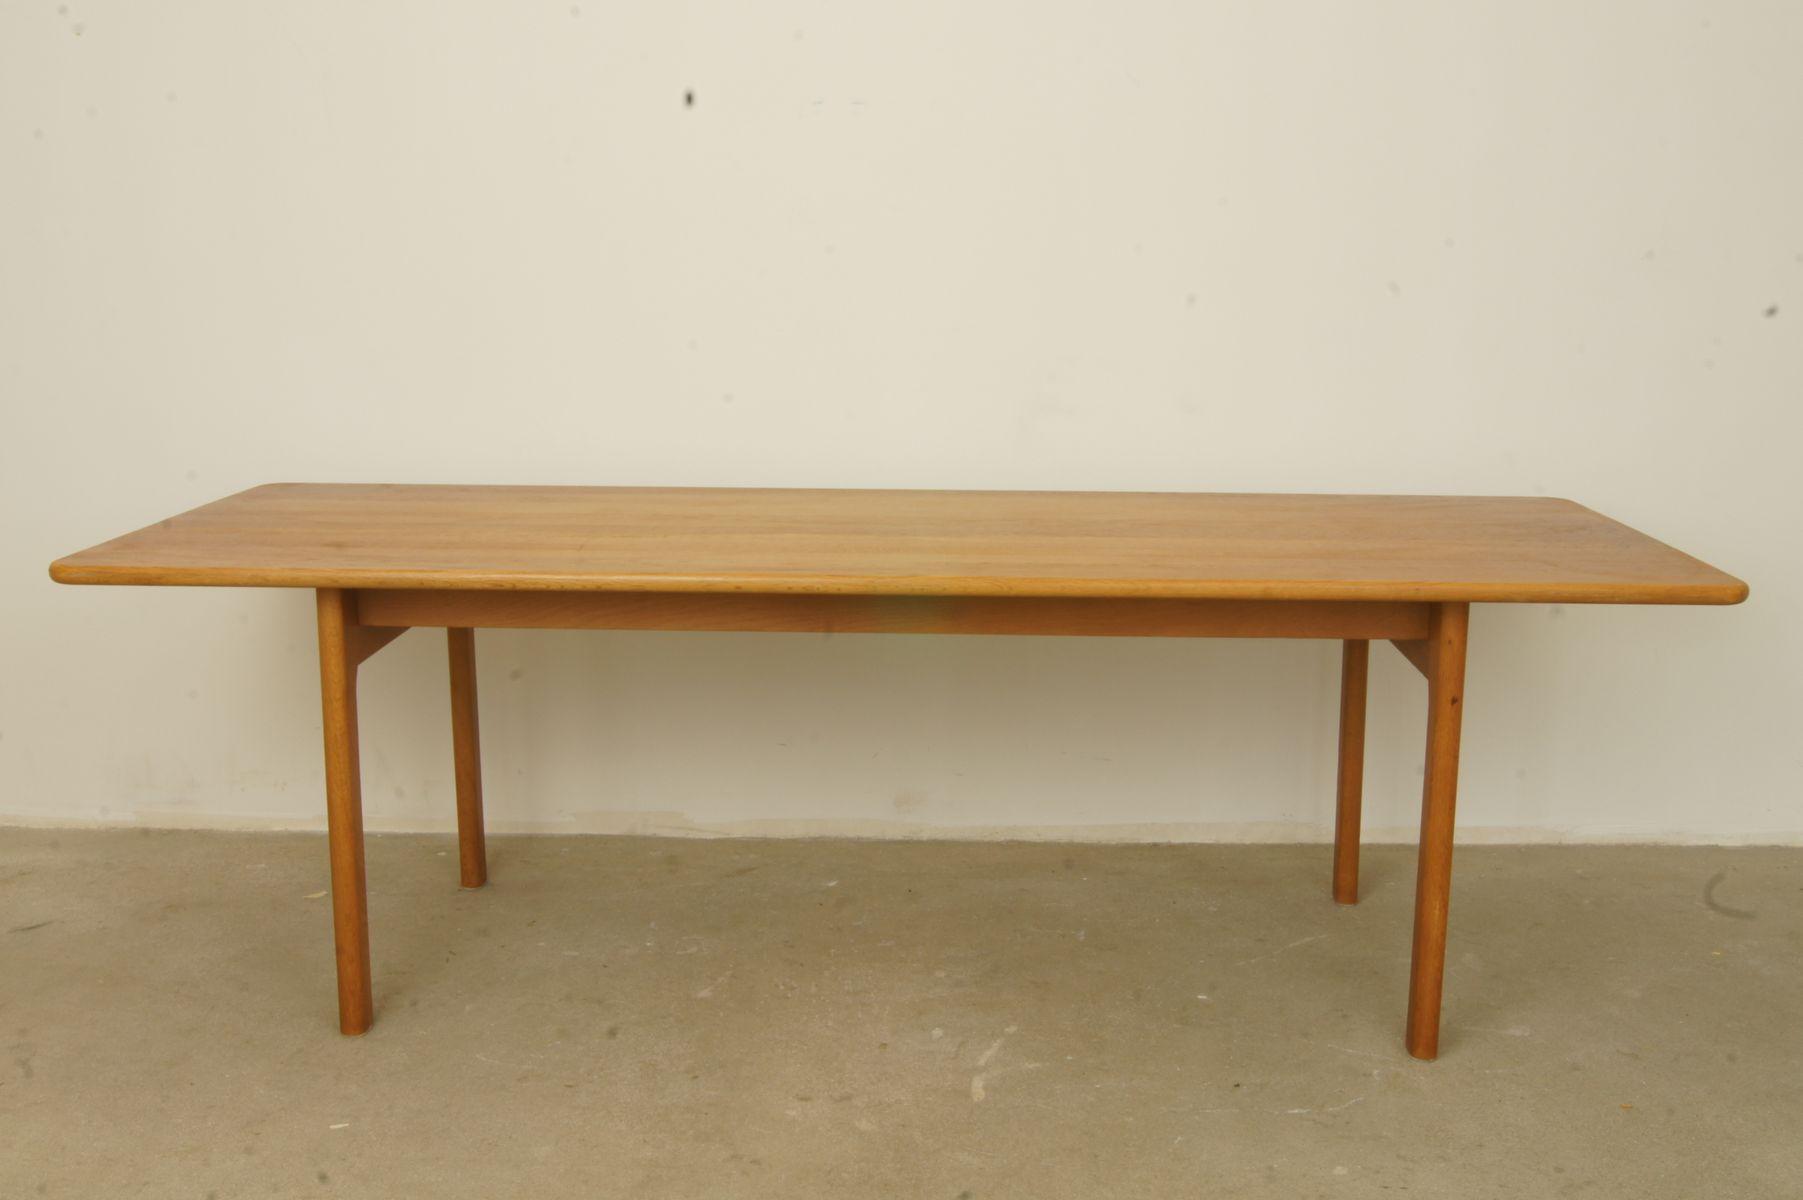 MidCentury Danish Oak Dining Table S For Sale At Pamono - Mid century oak dining table